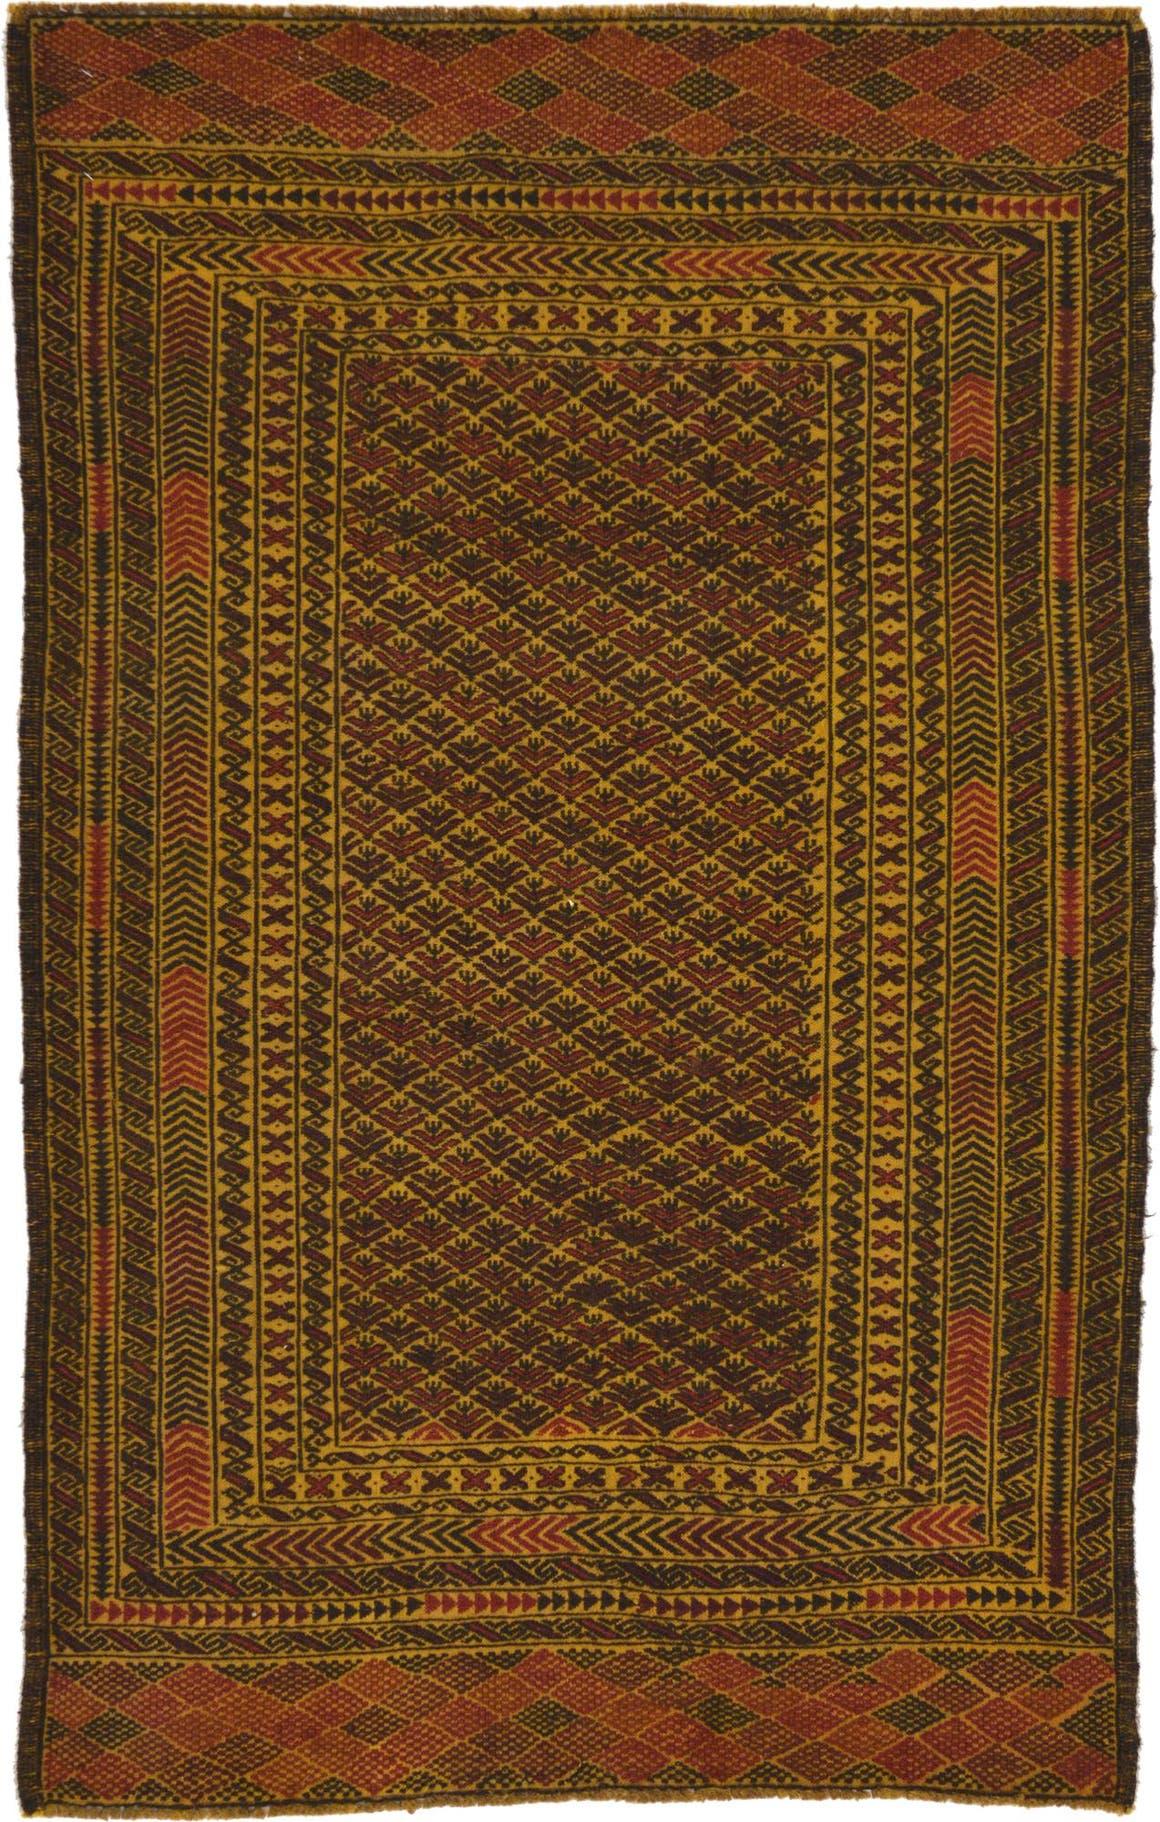 3' 10 x 6' 2 Kilim Afghan Rug main image